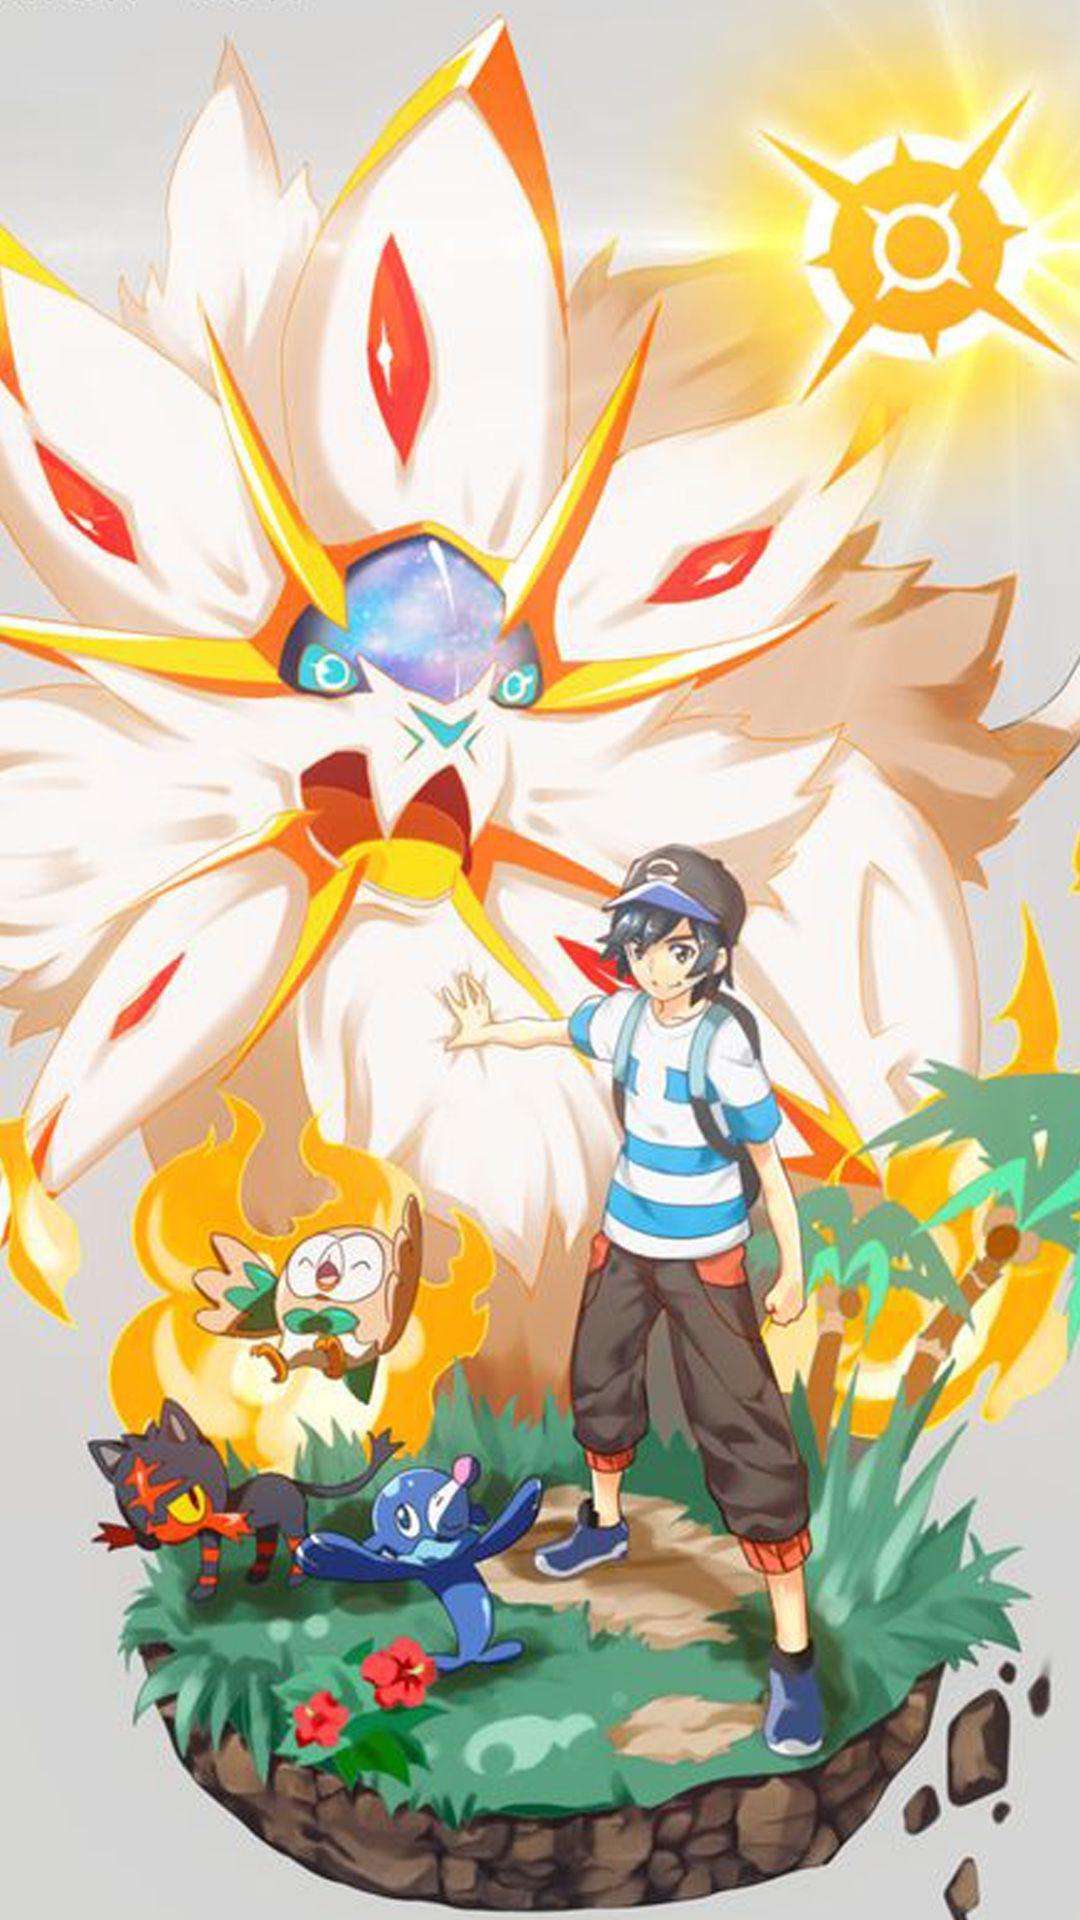 Anime Pokemon Phone Wallpapers Wallpaper Cave